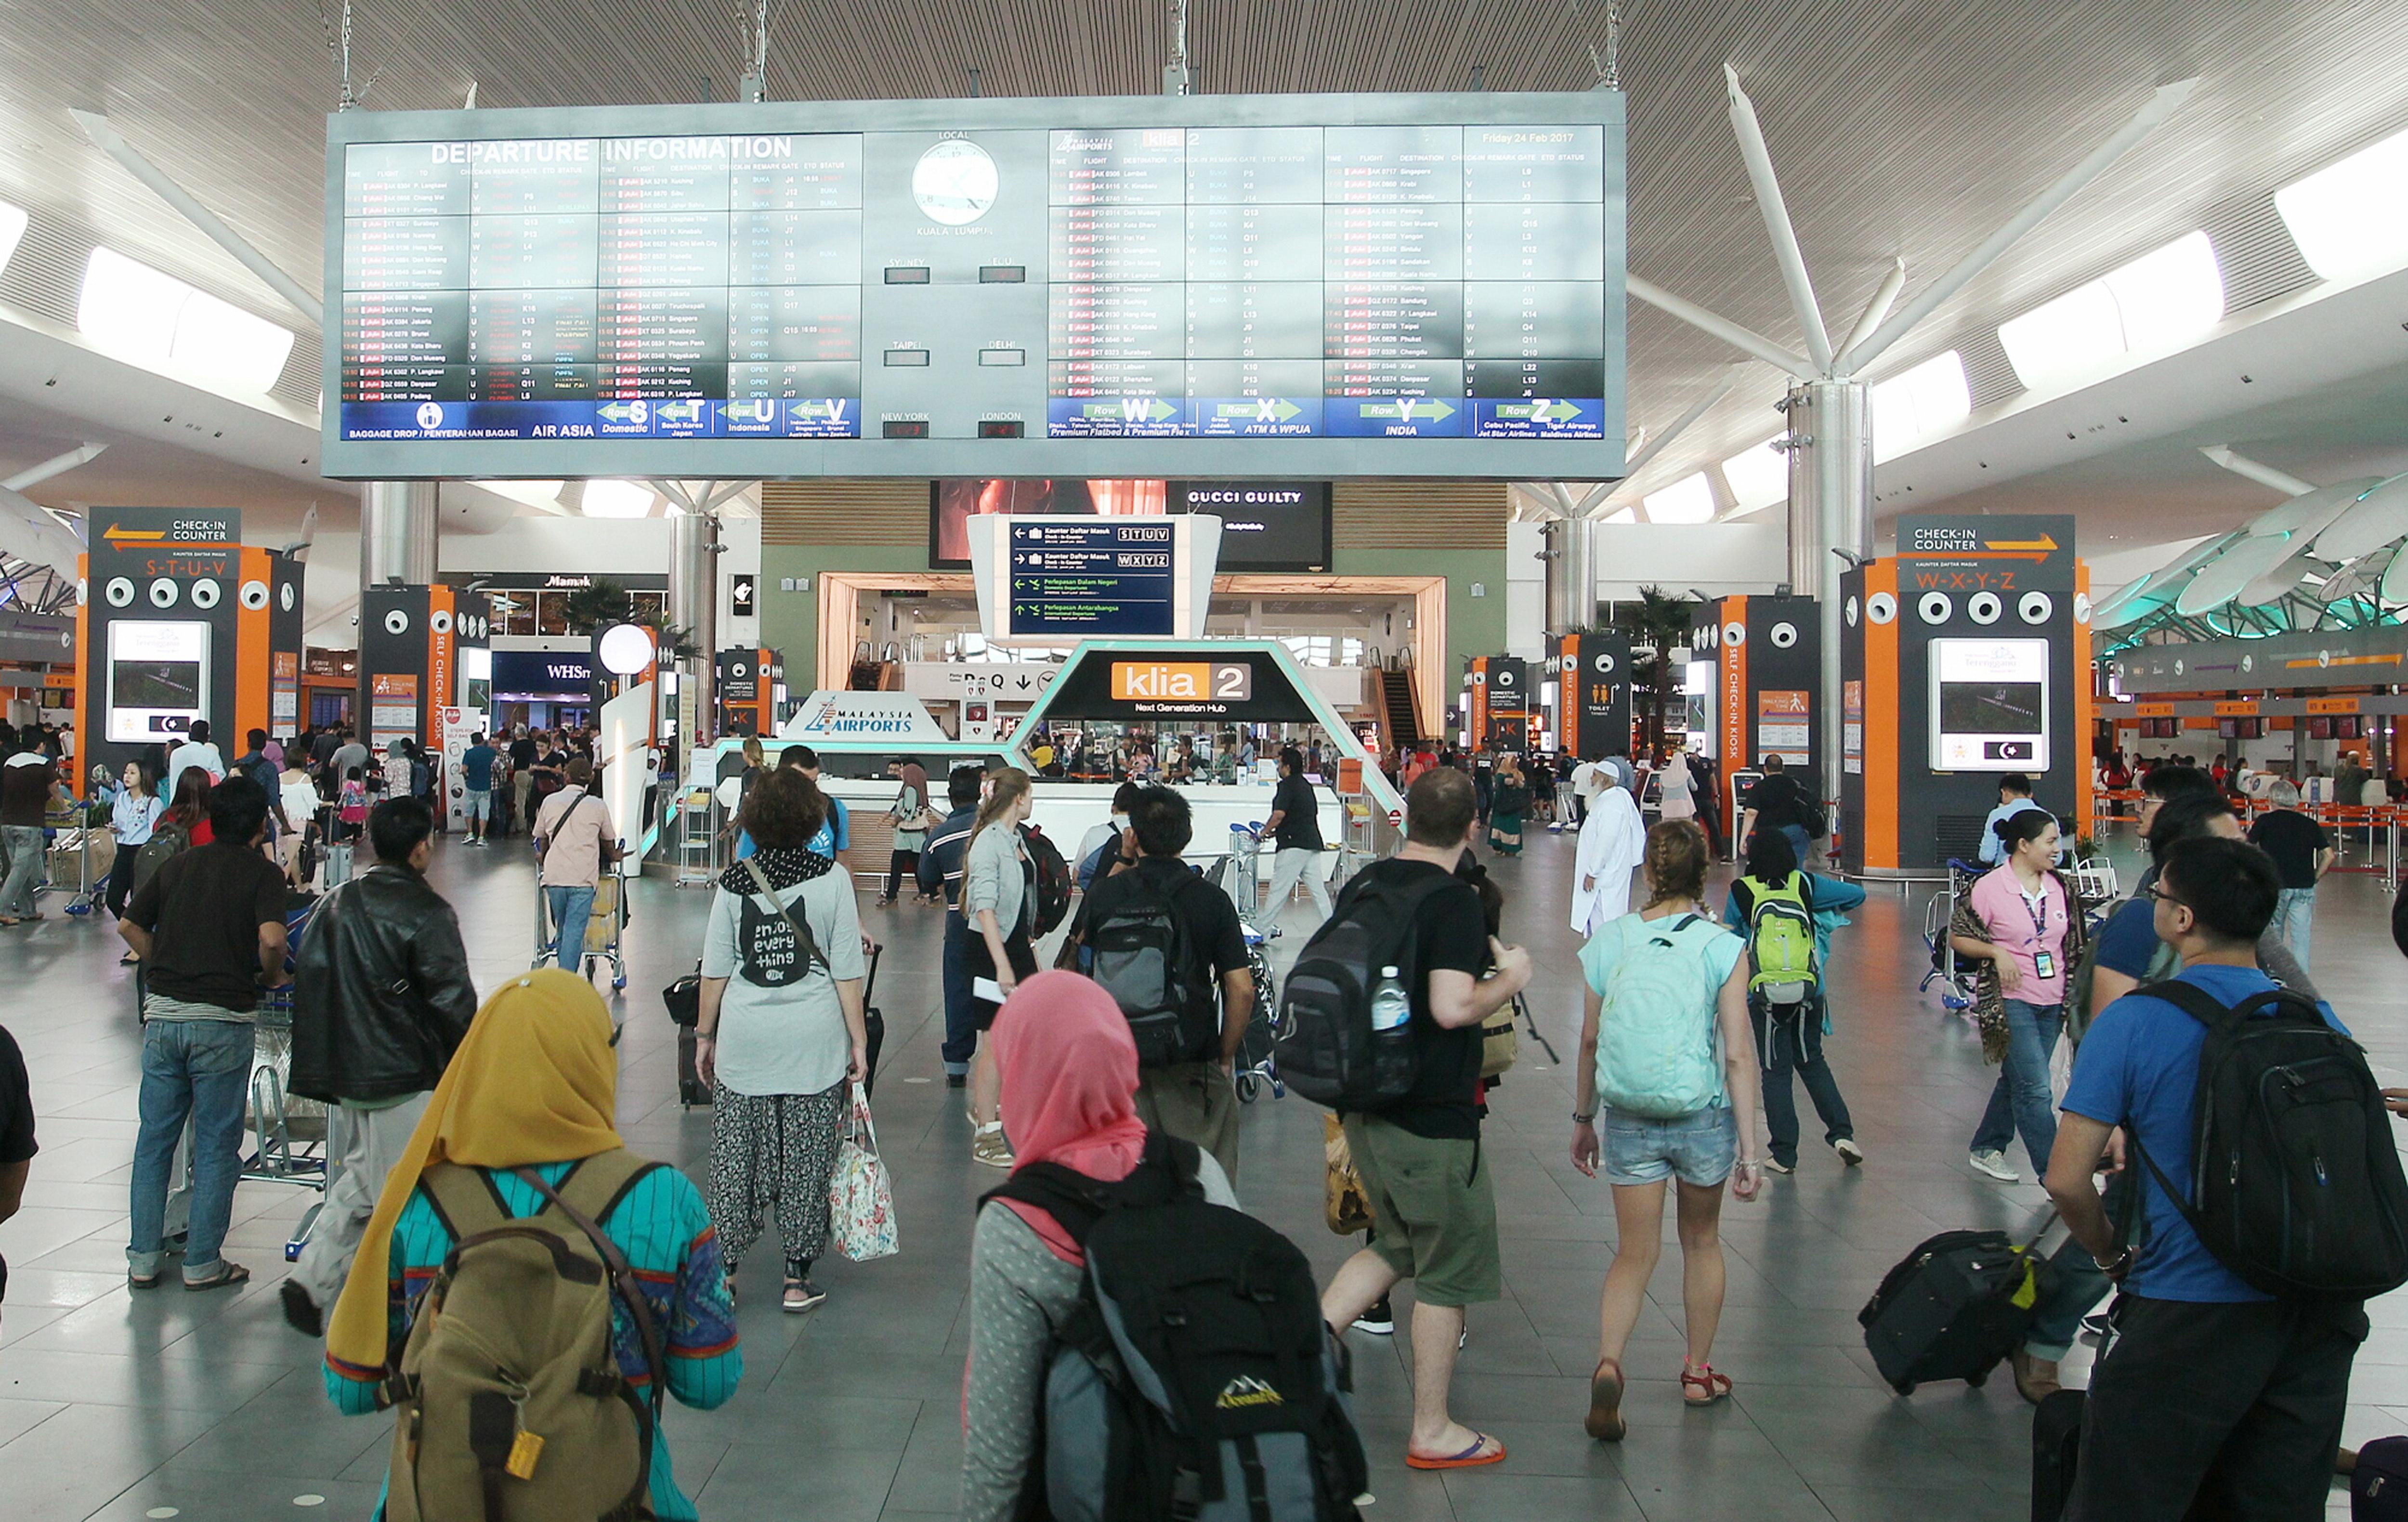 Passengers scan departure information at the Kuala Lumpur International Airport in Sepang, Malaysia on Feb. 24, 2017. (AP Photo)